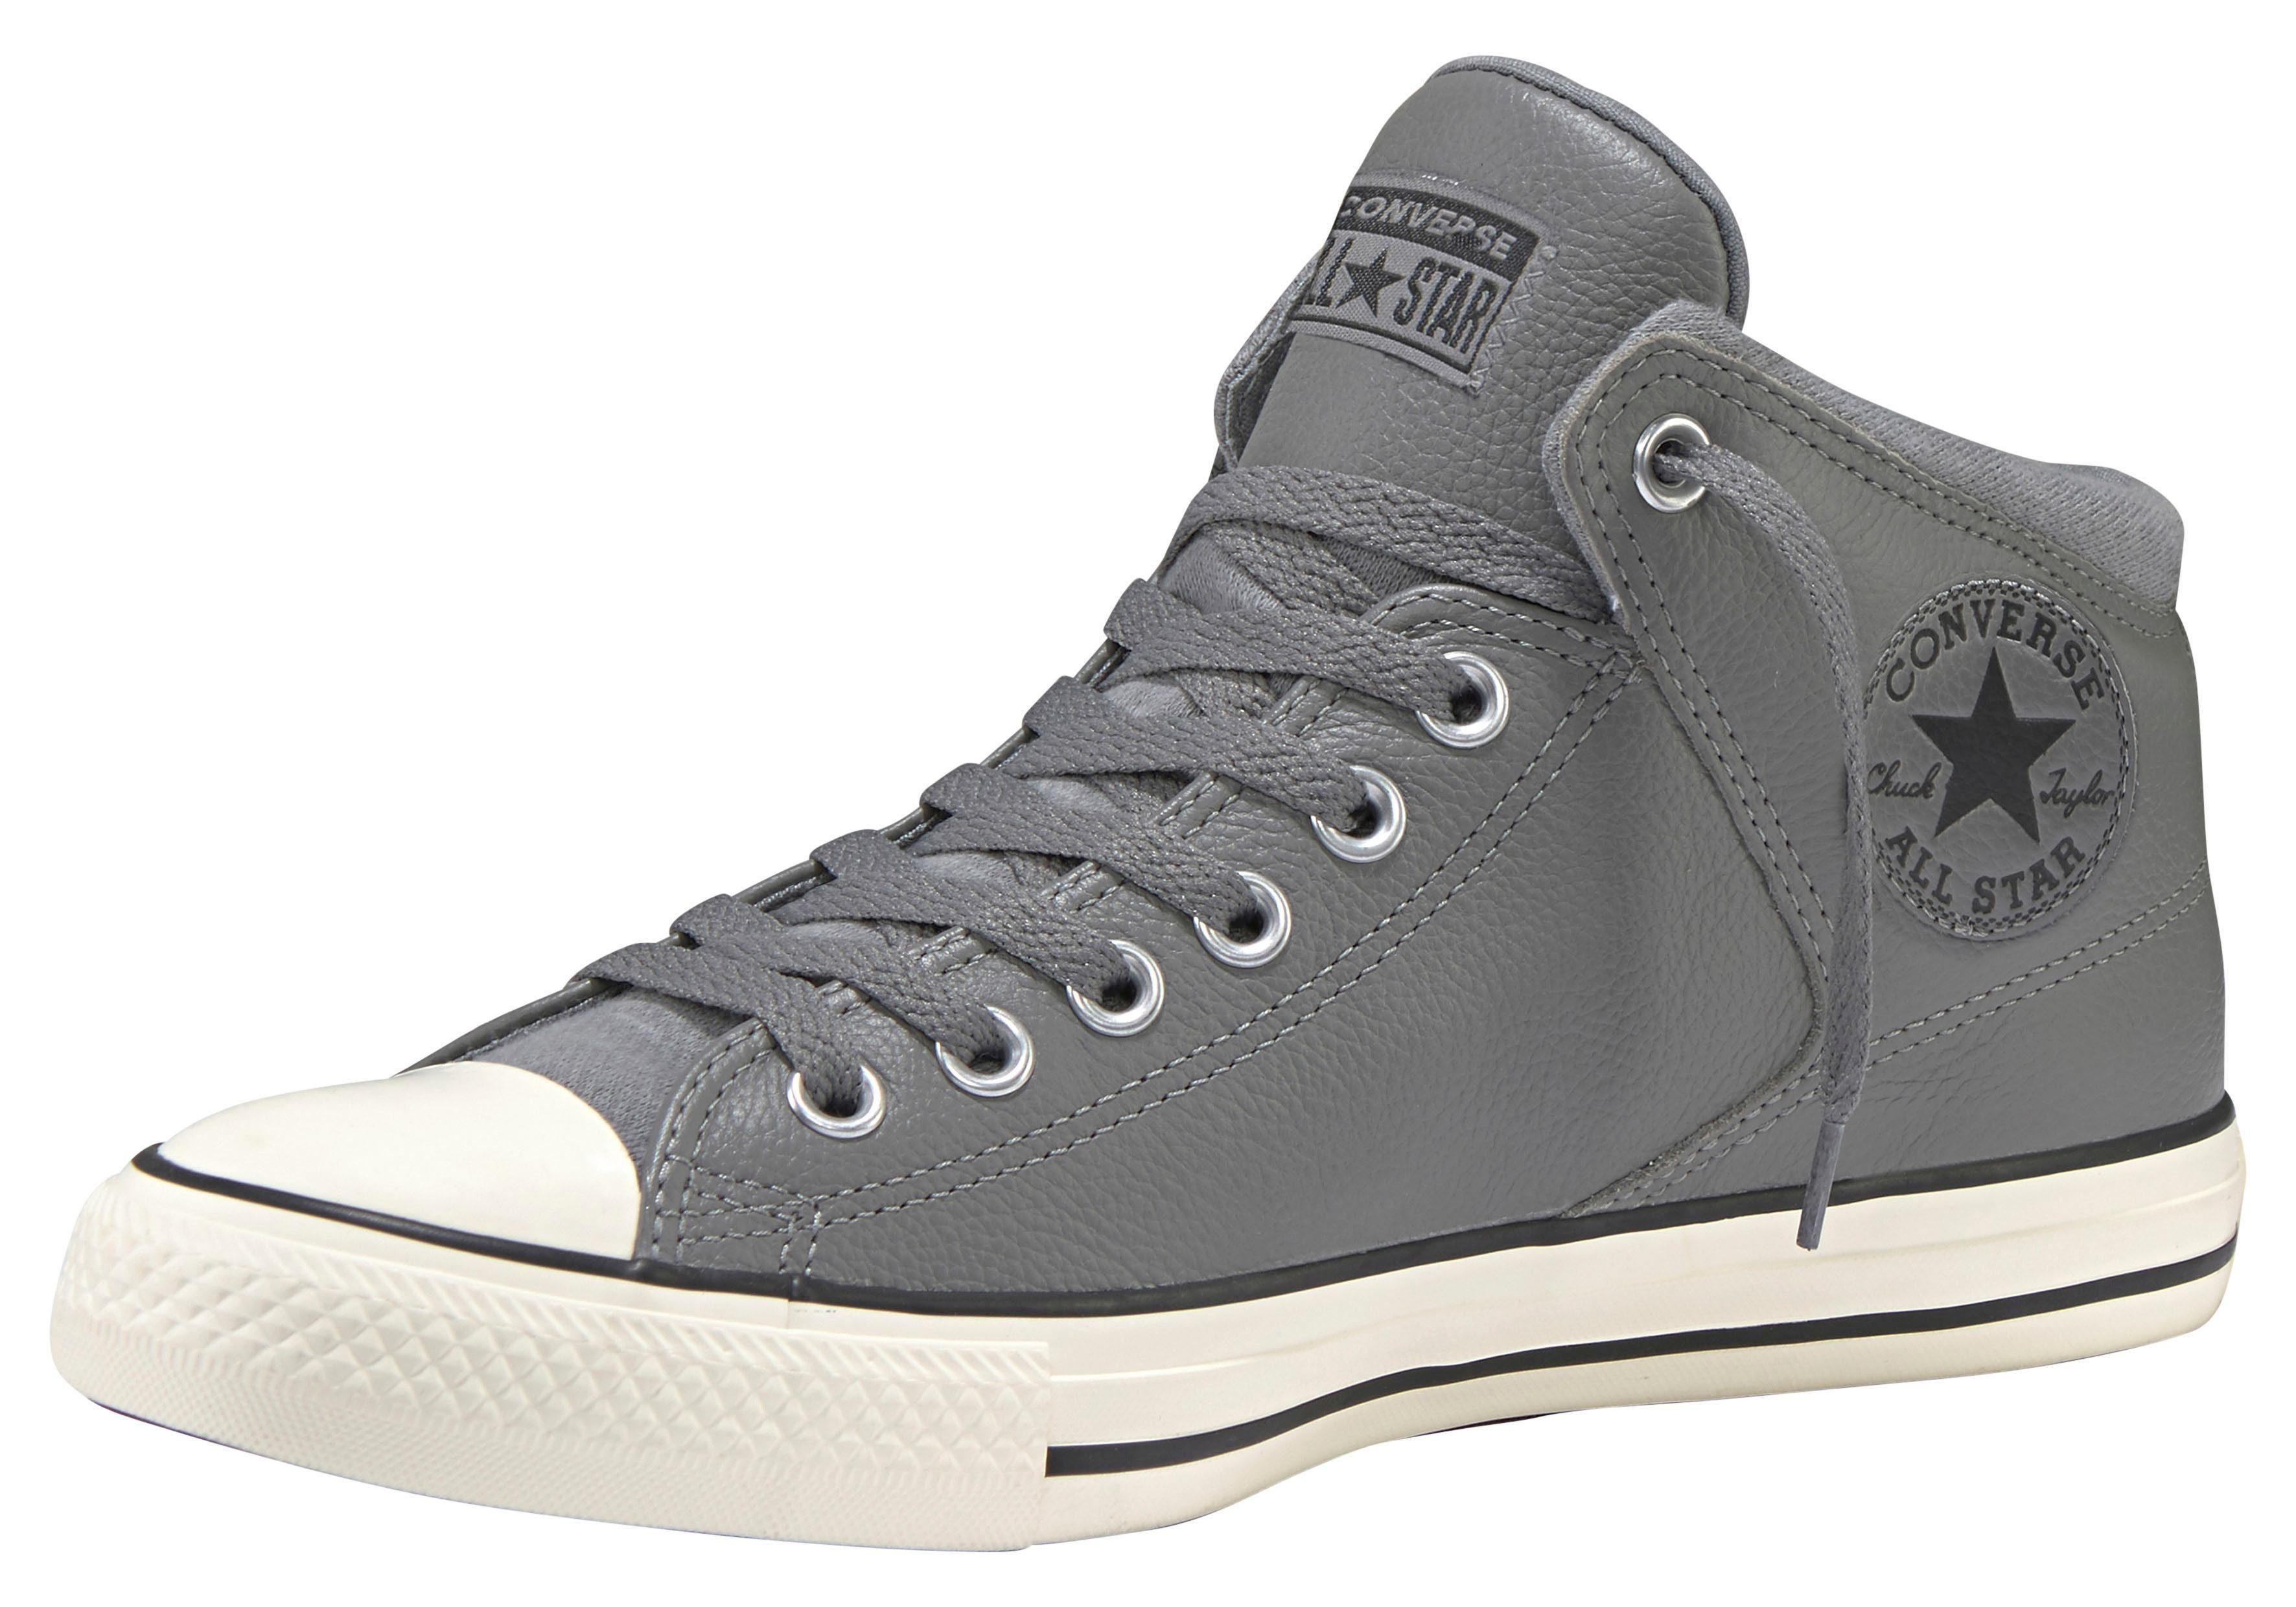 Grau Schuhe Converse | Chuck Taylor All Star High Sneaker